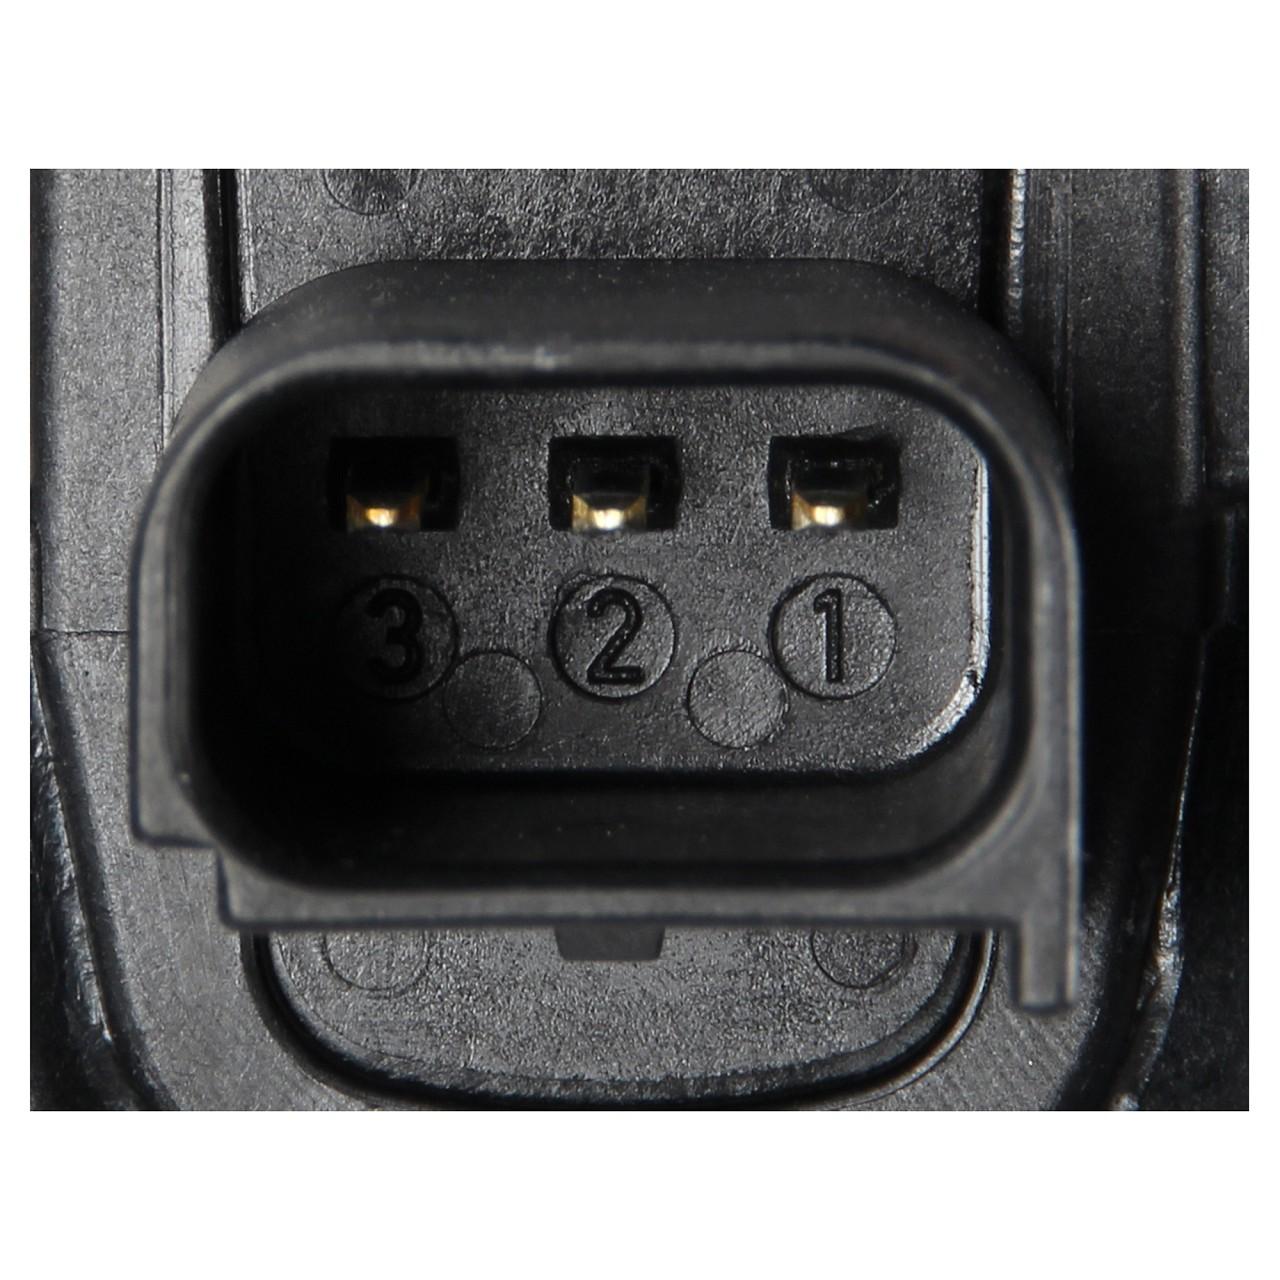 ORIGINAL Ford Zündspule Zündmodul FIESTA V ST150 MONDEO III 1.8/2.0 16V 1458400